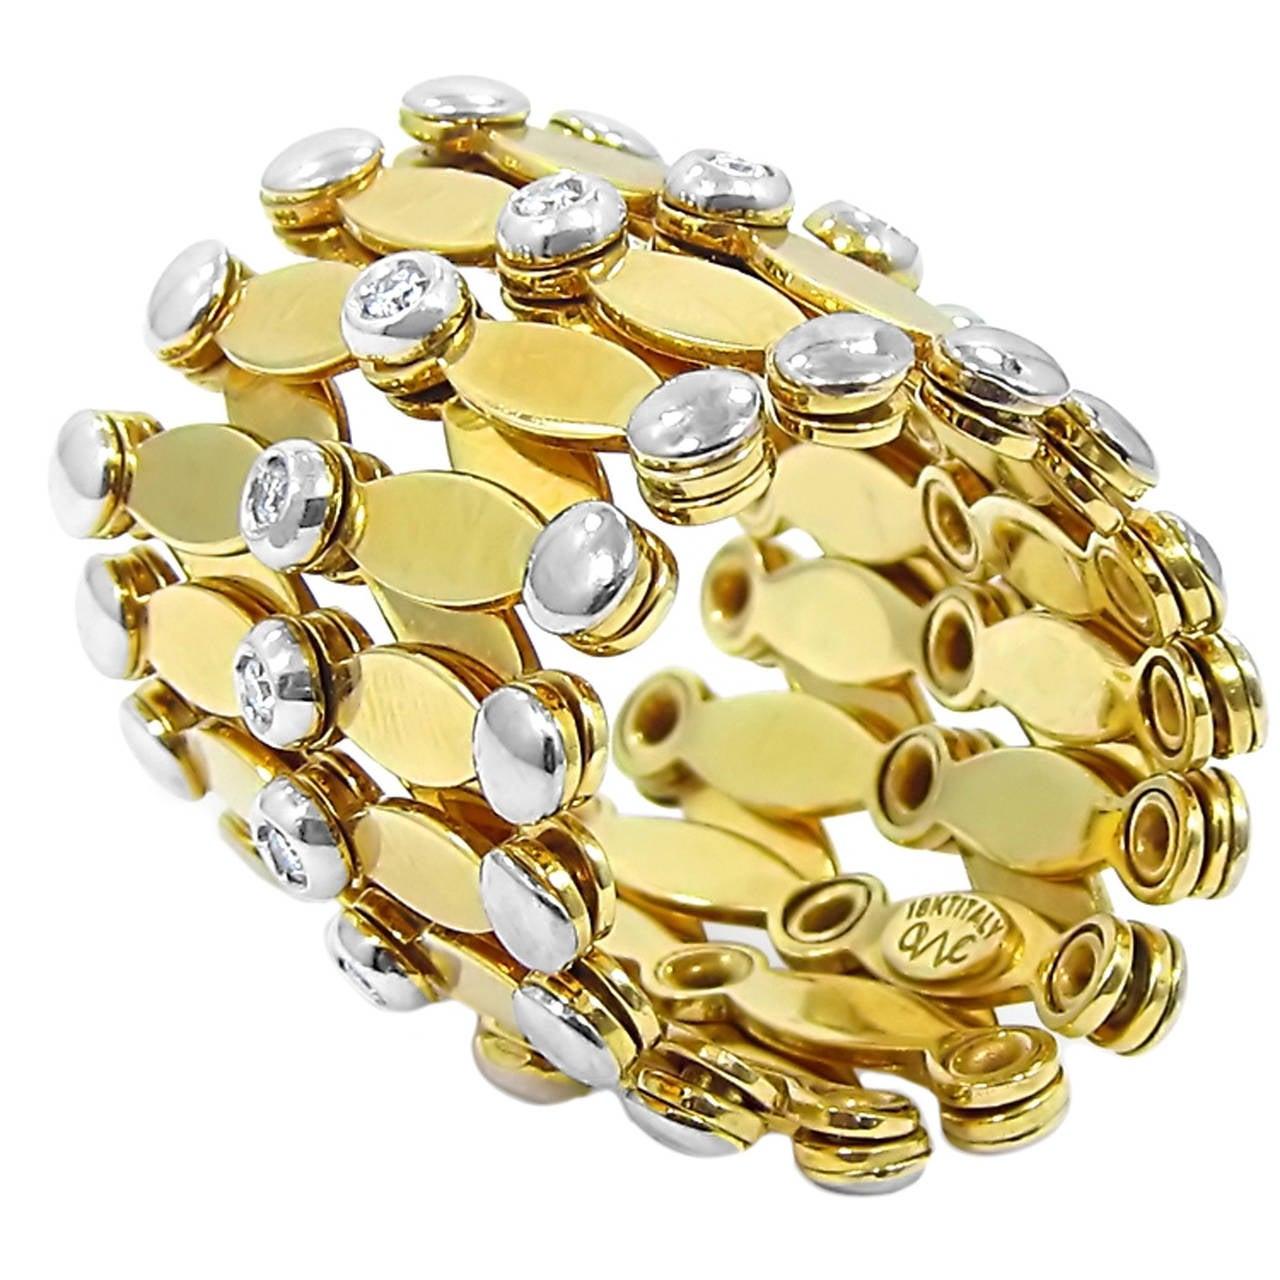 Gold Band Bracelet: Diamond Gold Expandable Bracelet/Ring For Sale At 1stdibs